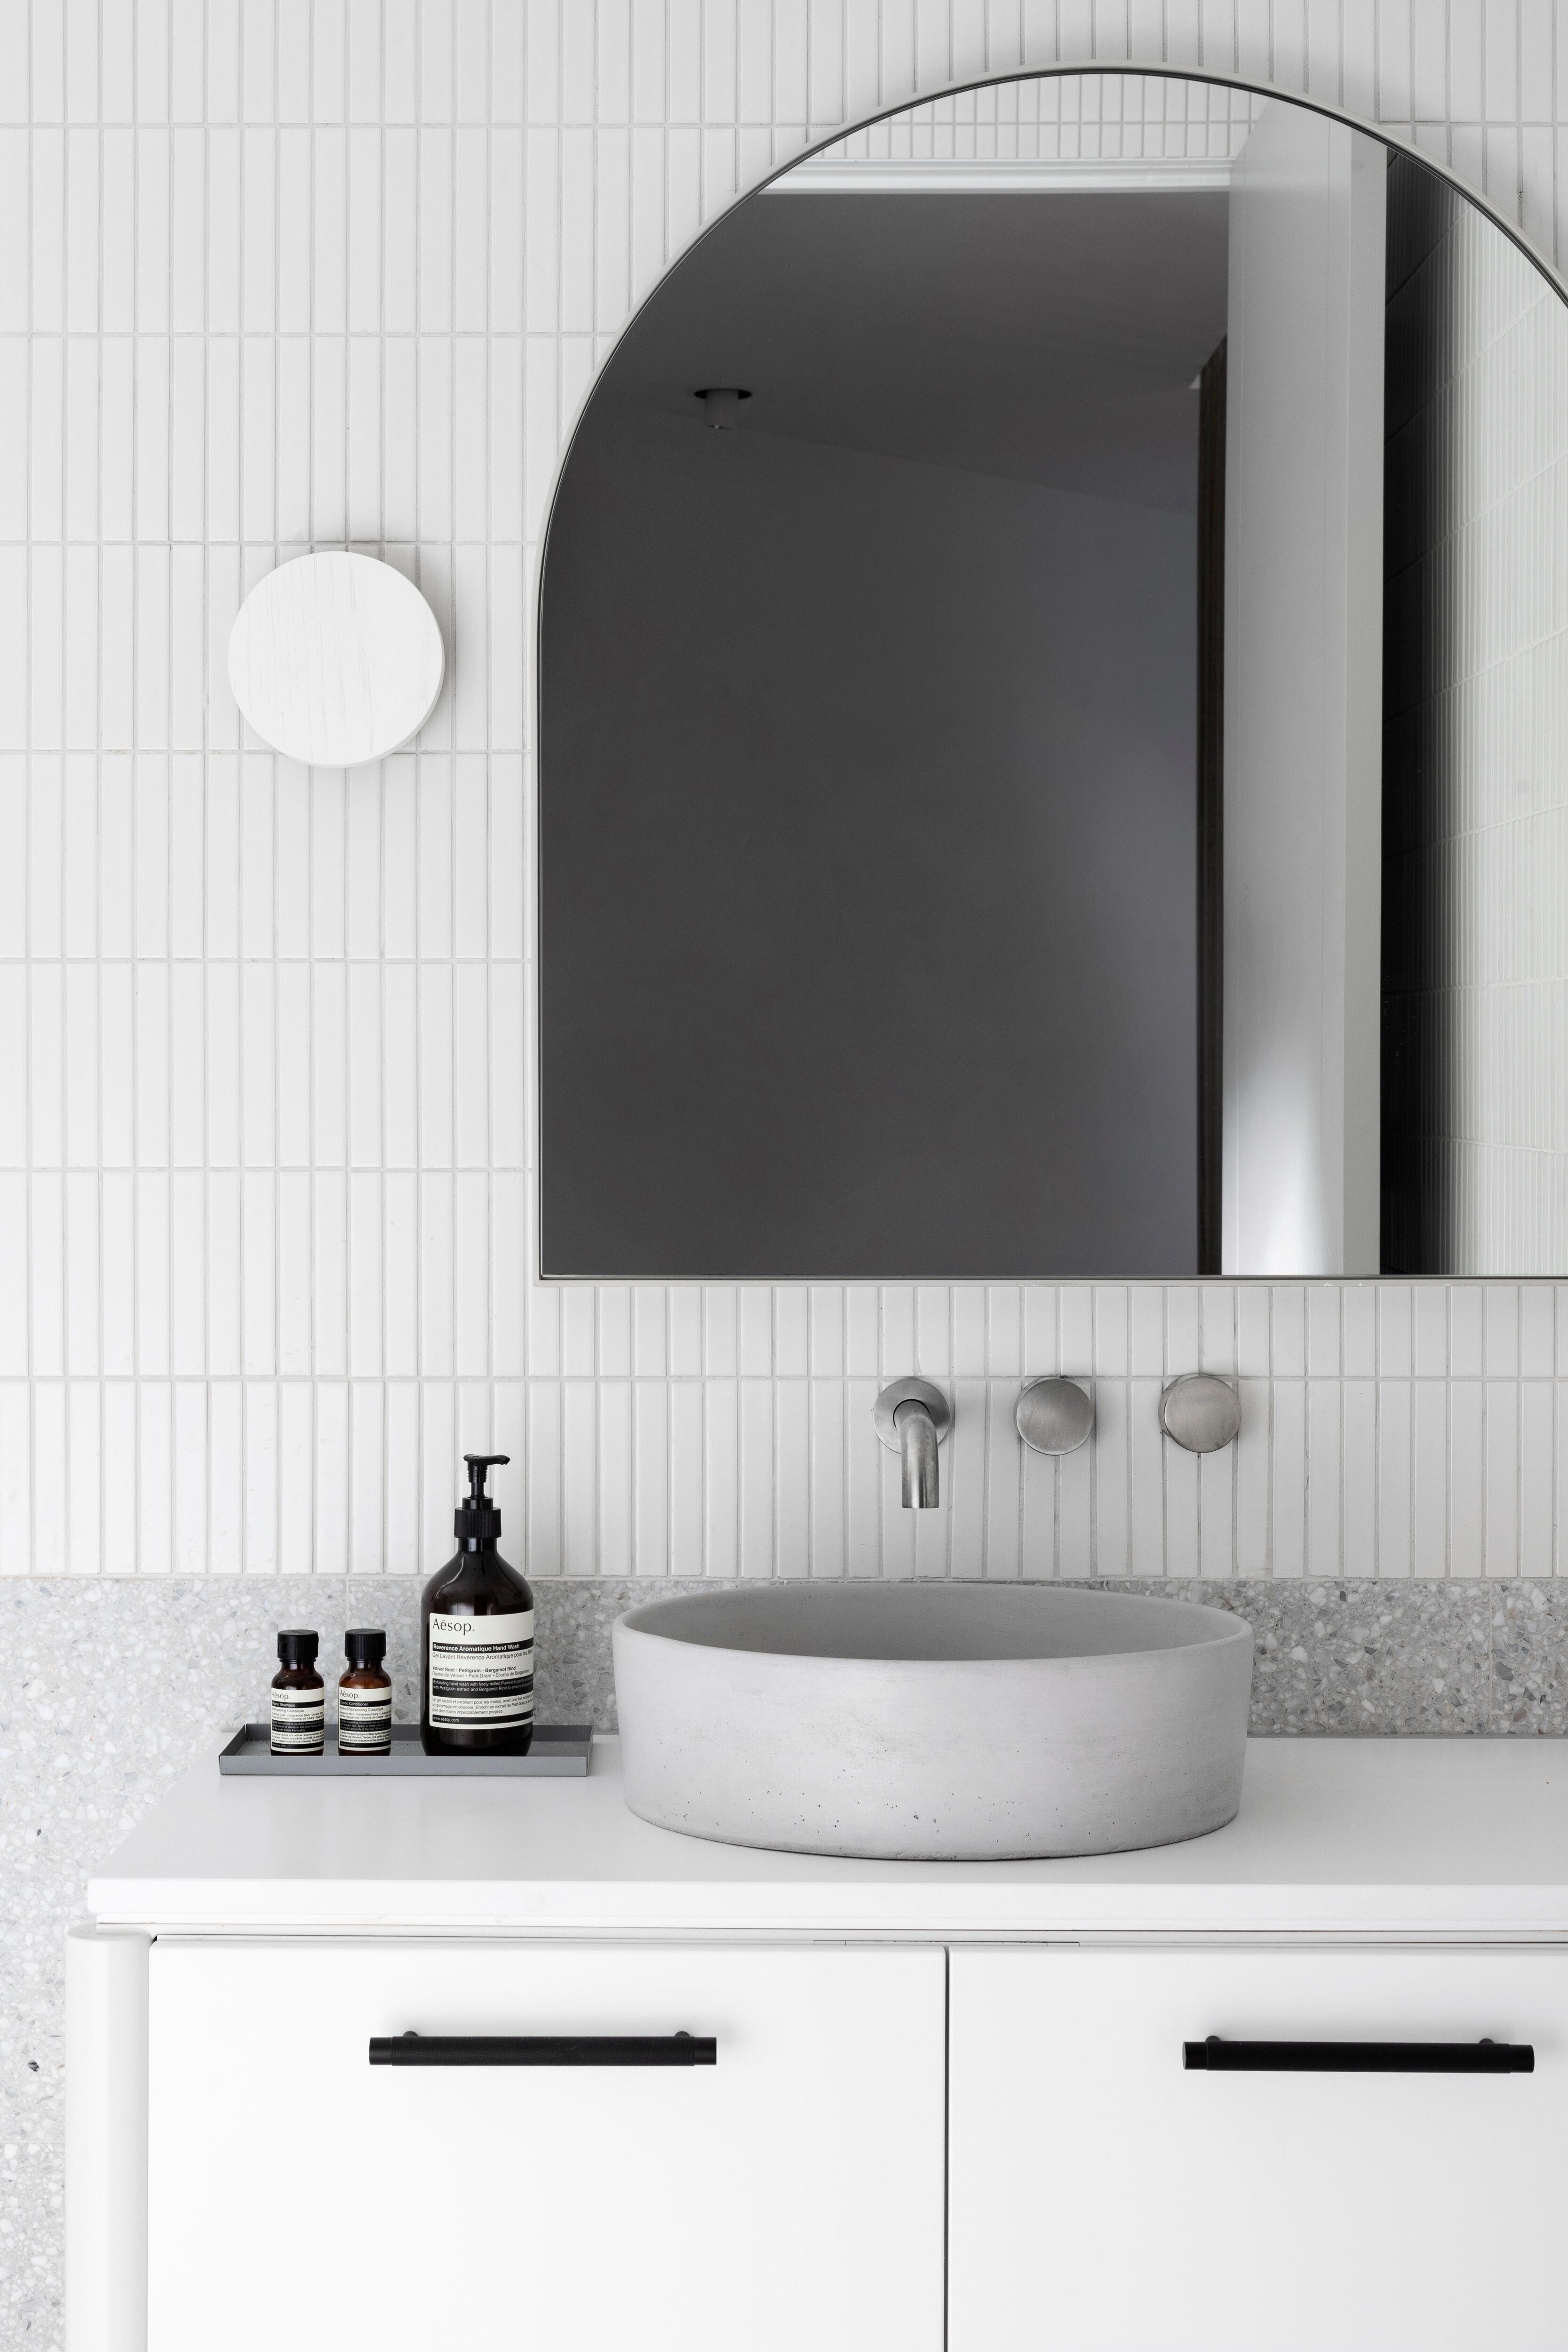 Concrete Nation Halo Basin.  #concretebasin #custombasin #concrete #basin #bathroom #renovation #bathroominterior